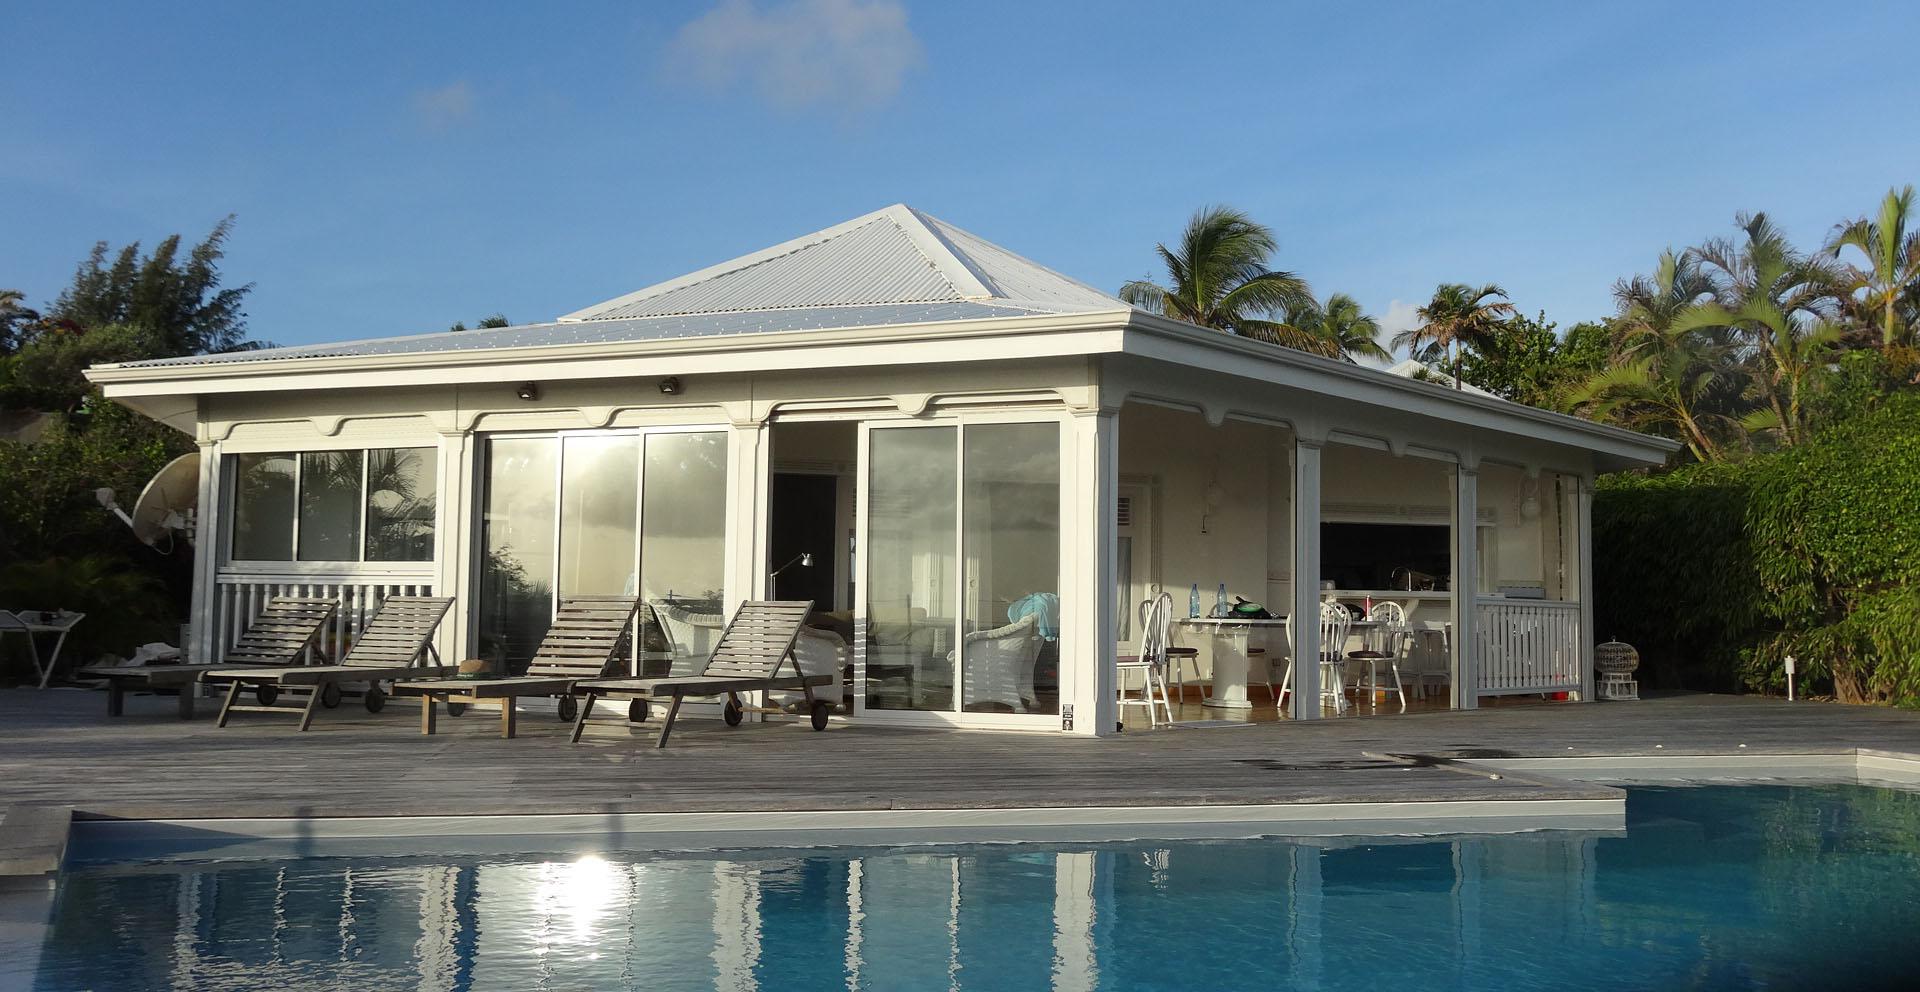 Charmante villa au style colonial